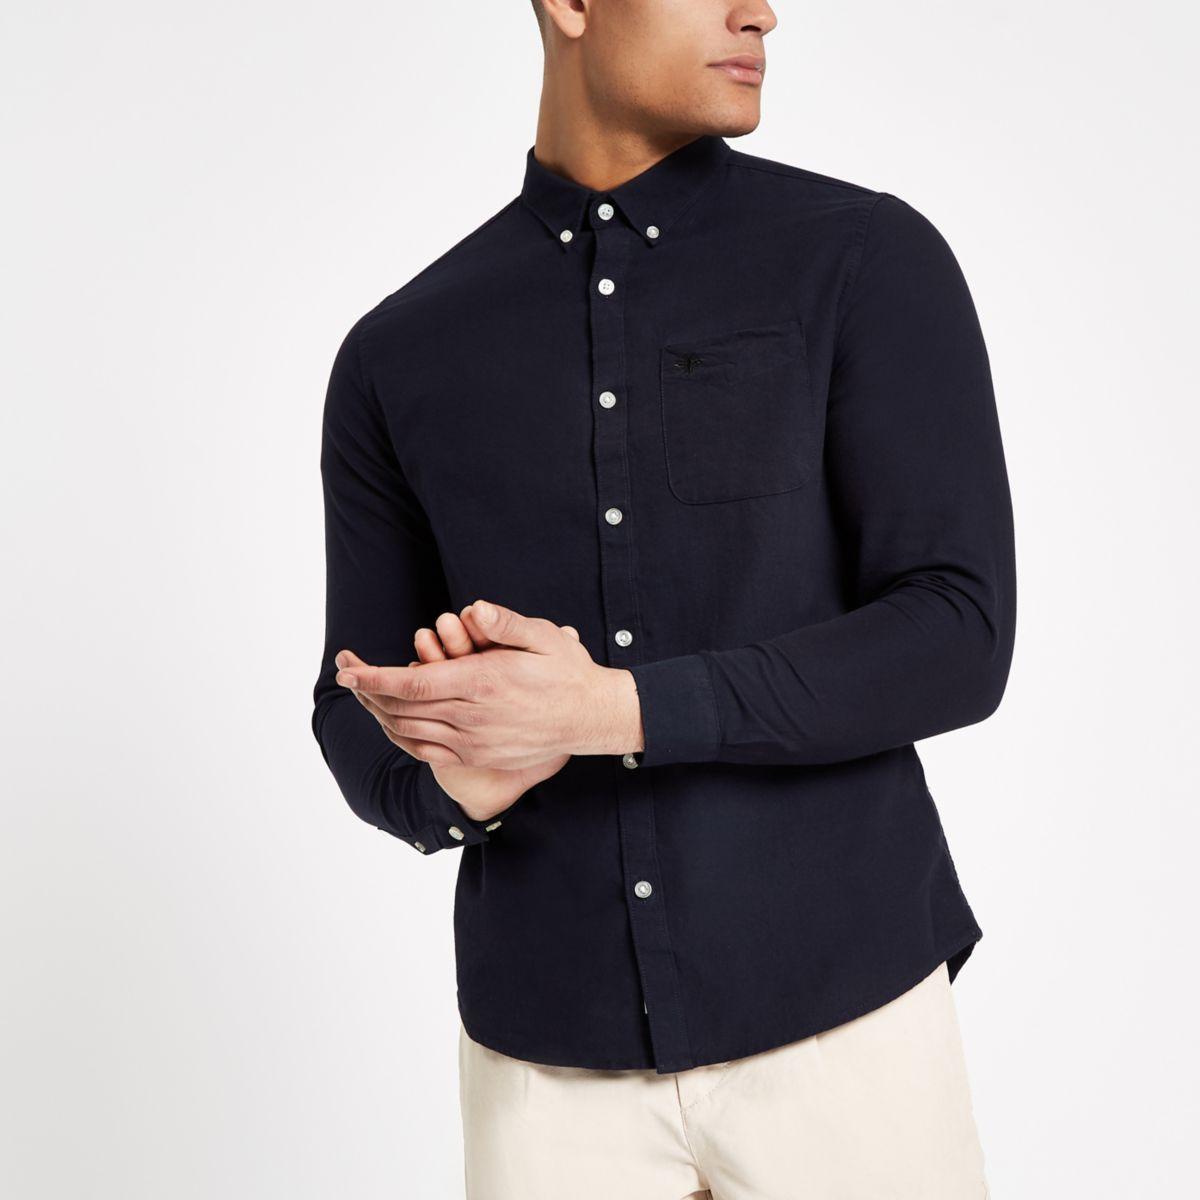 Navy wasp embroidered pocket Oxford shirt